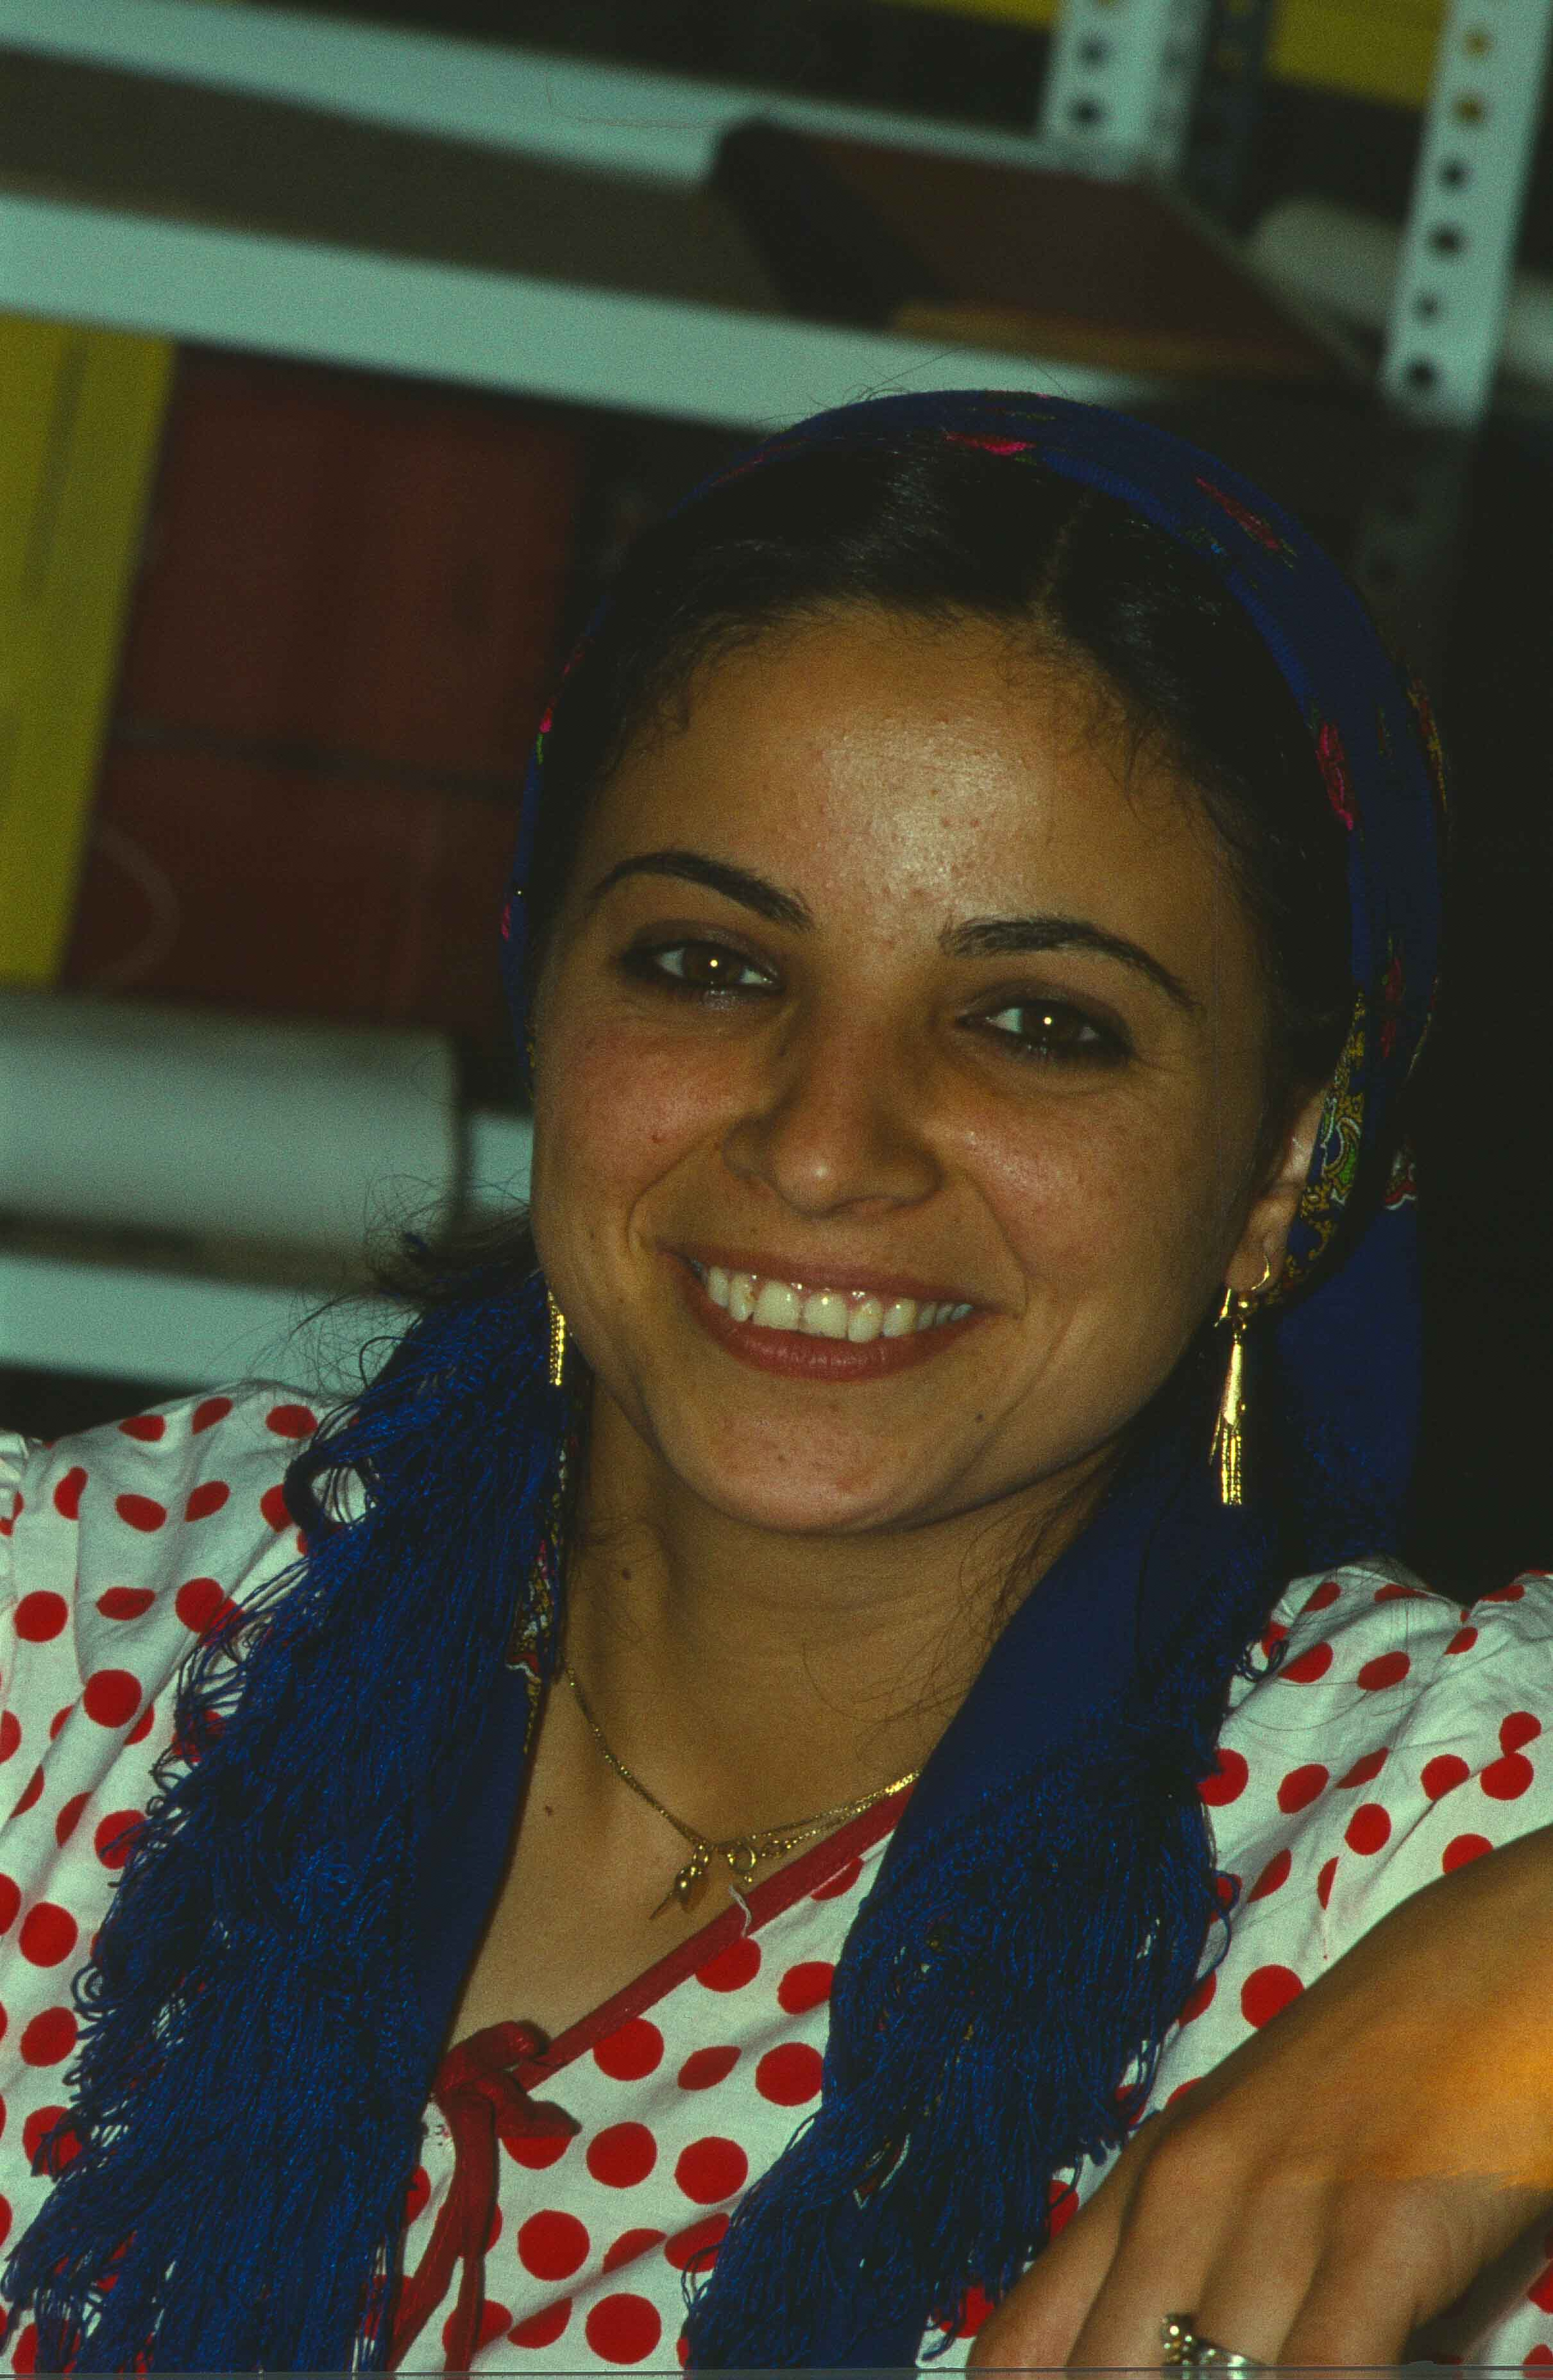 91. Libanon